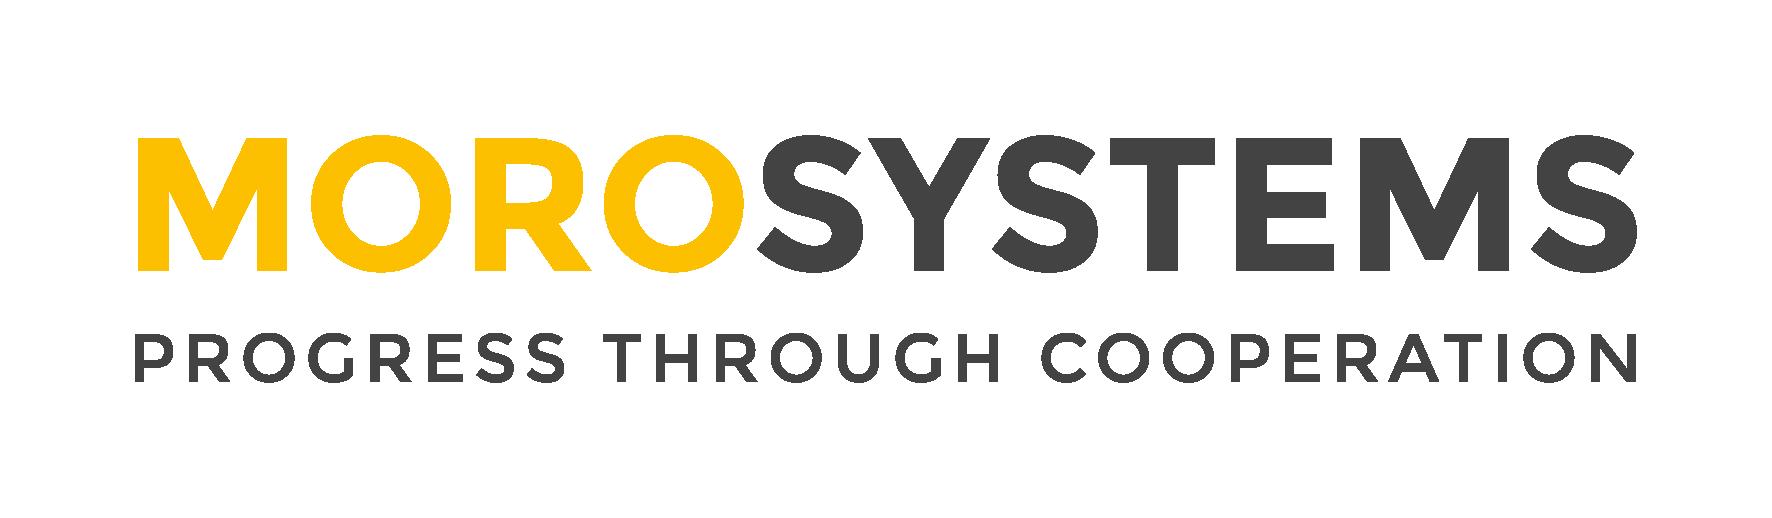 MoroSystems